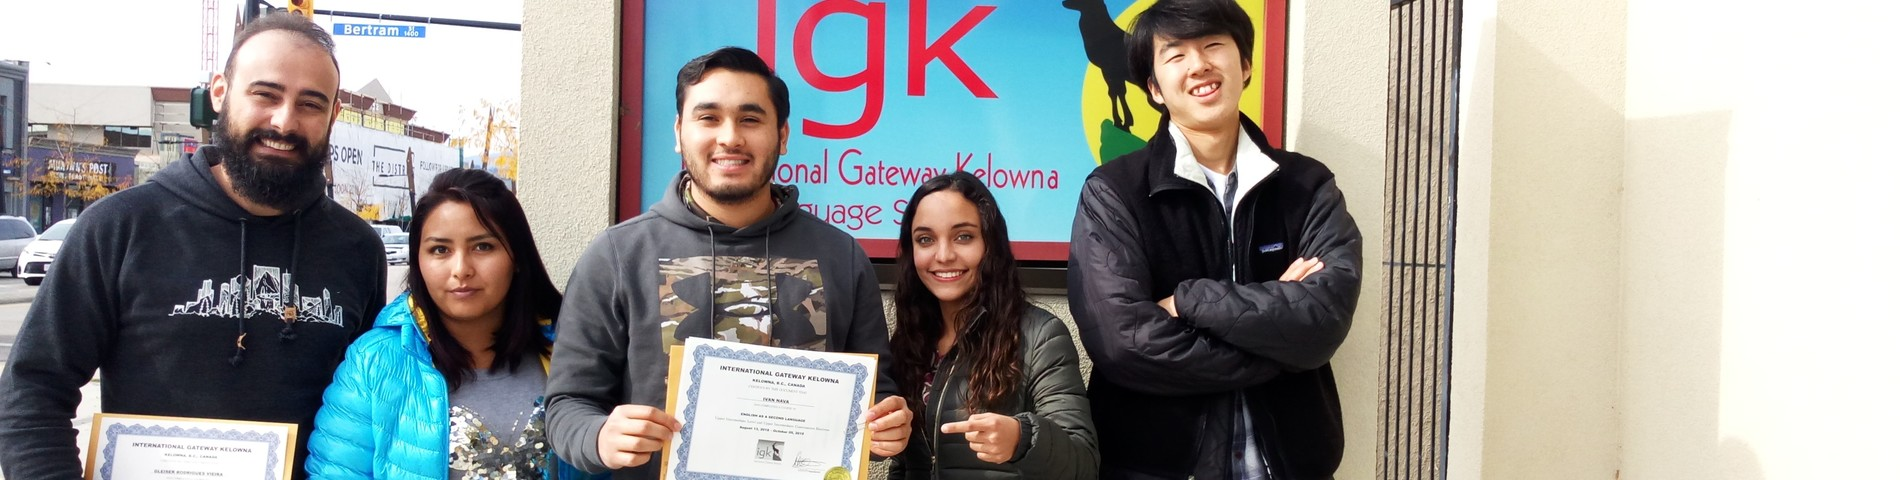 International Gateway Kelowna picture 1